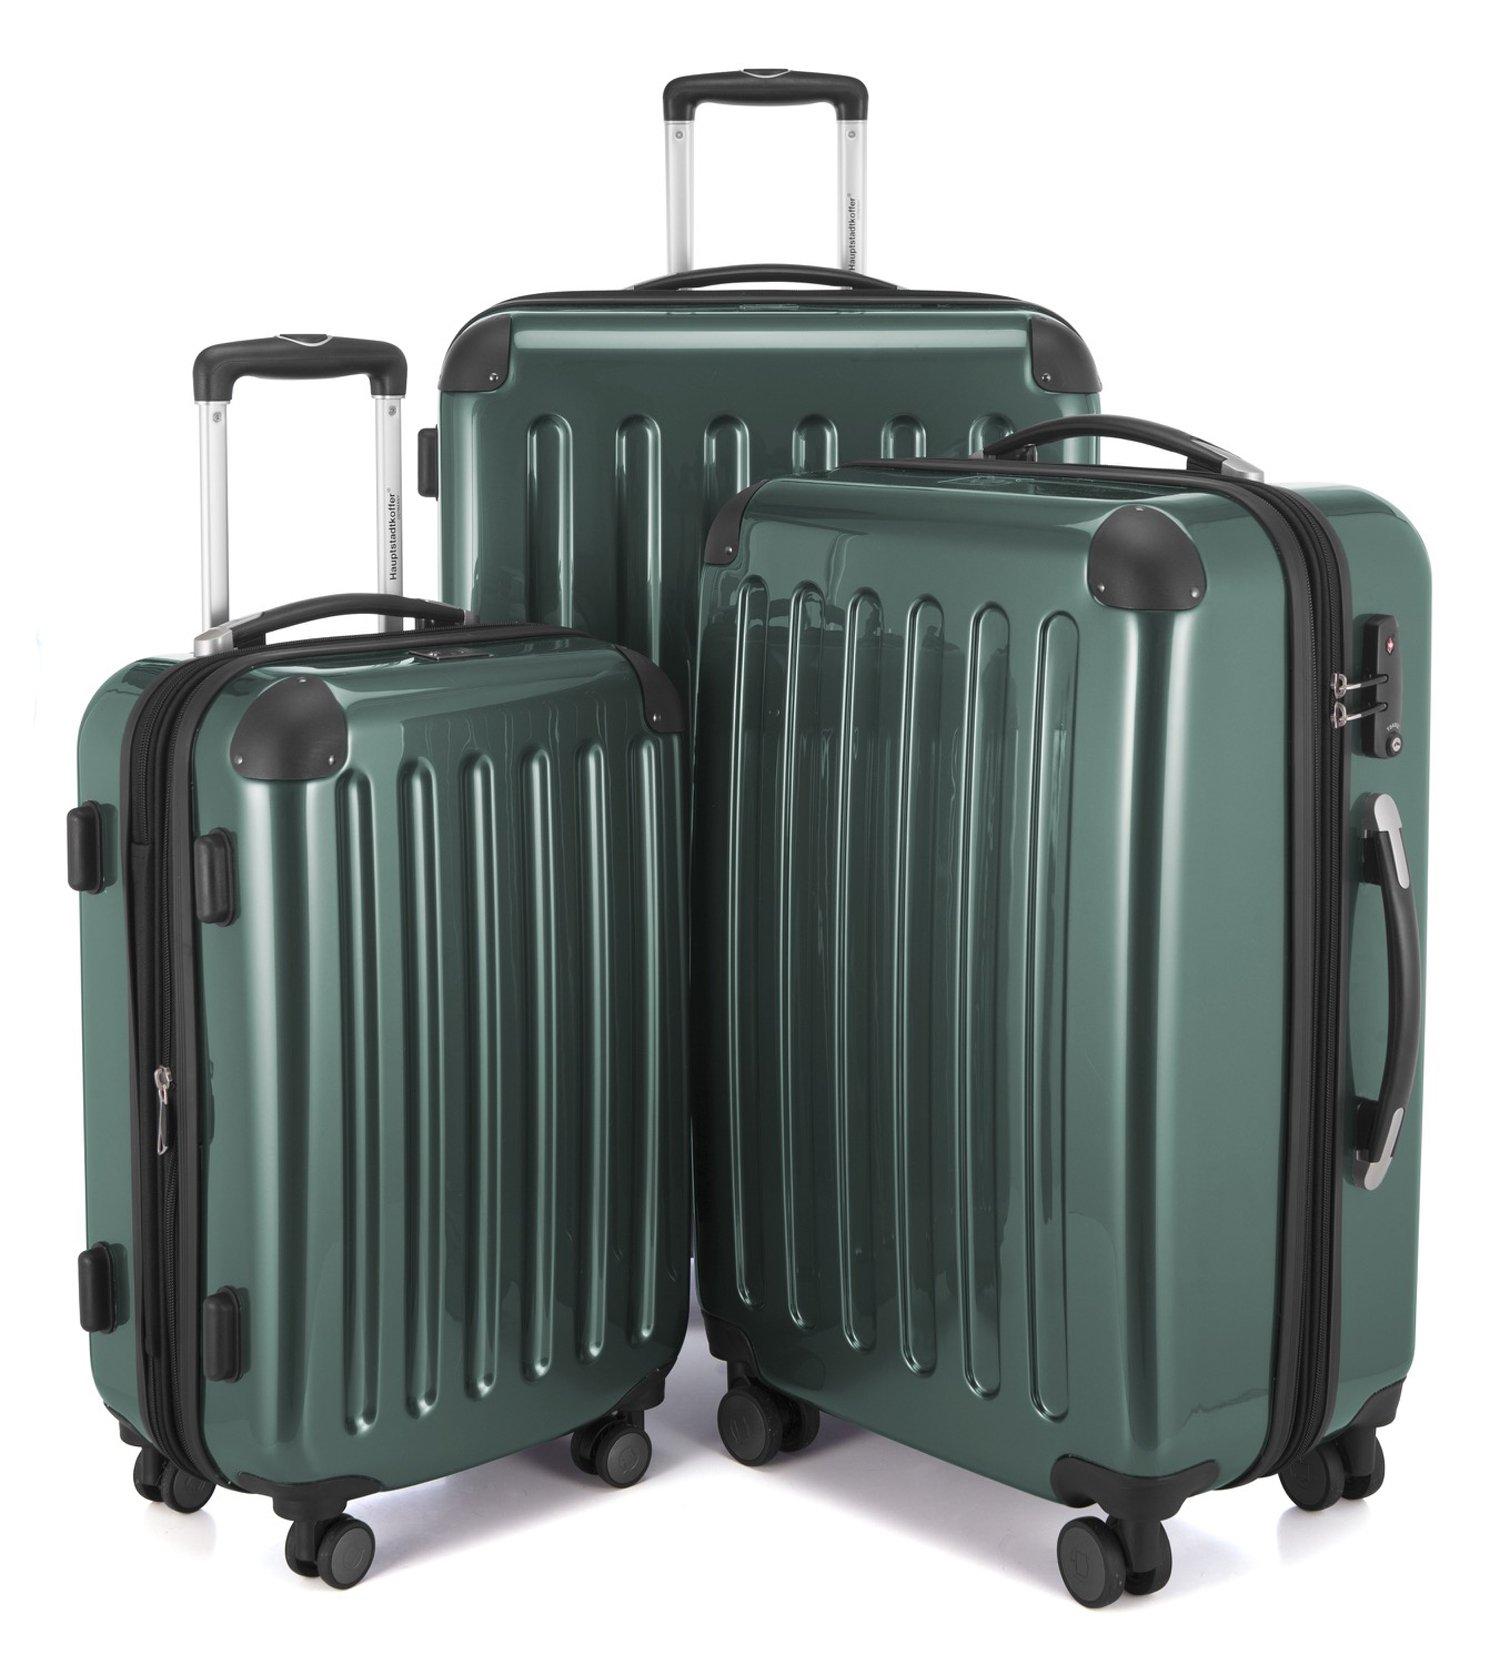 HAUPTSTADTKOFFER Alex Double Wheel Luxurious Luggage Set 18 different colors Suitcase Set Size (20'24'28') Trolley TSA Darkgreen